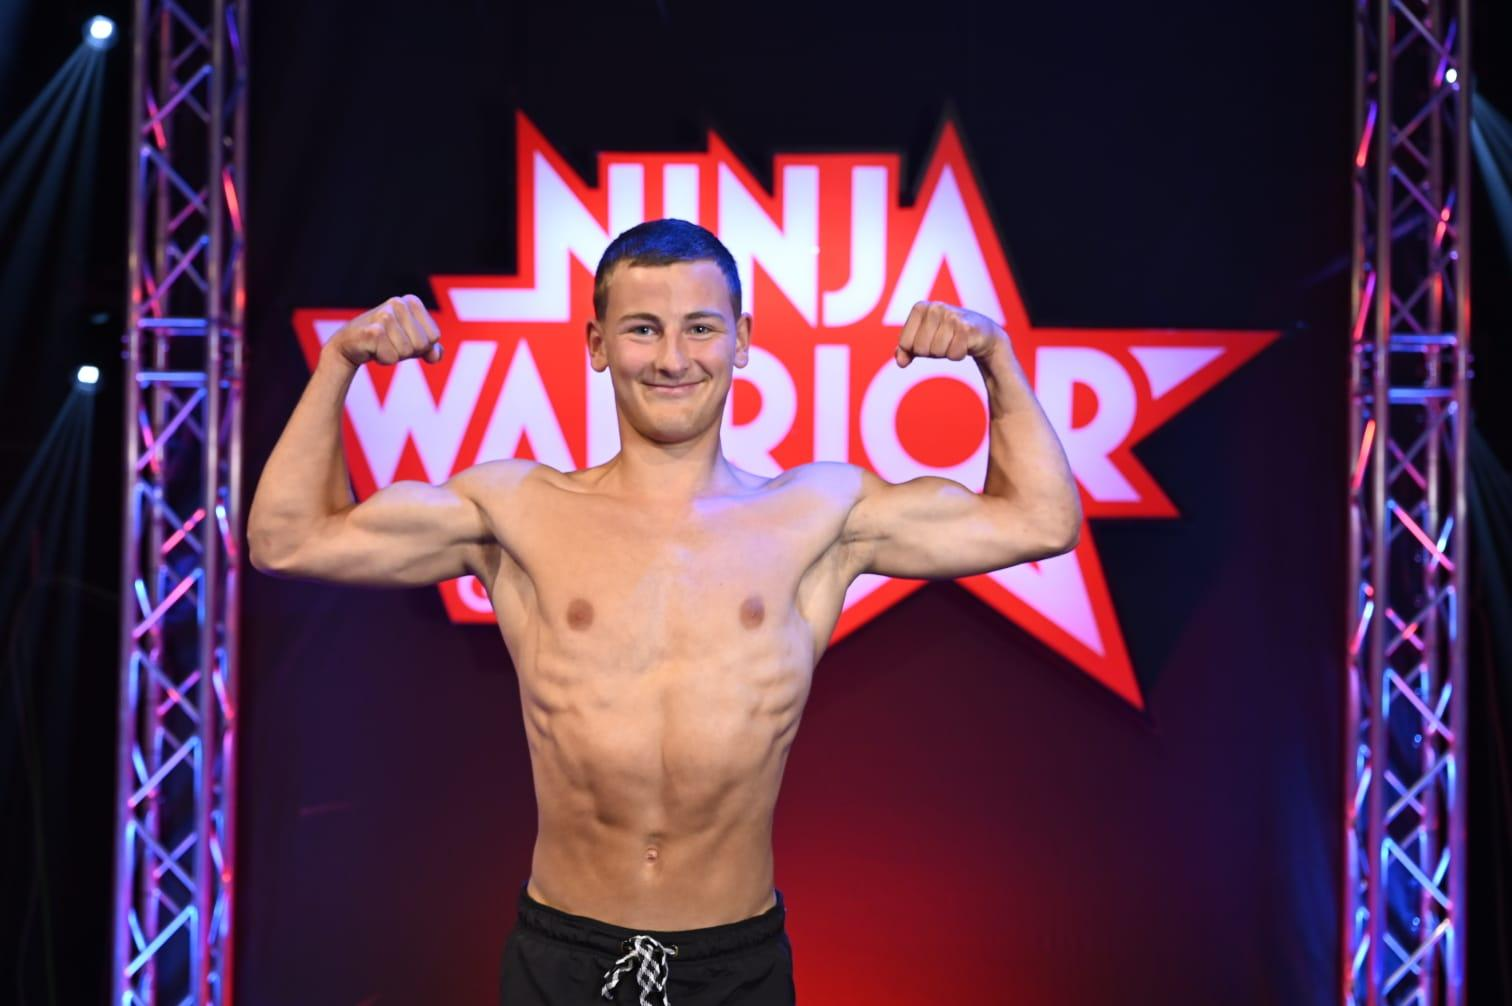 Ninja WarriorPatrick Mengel F4